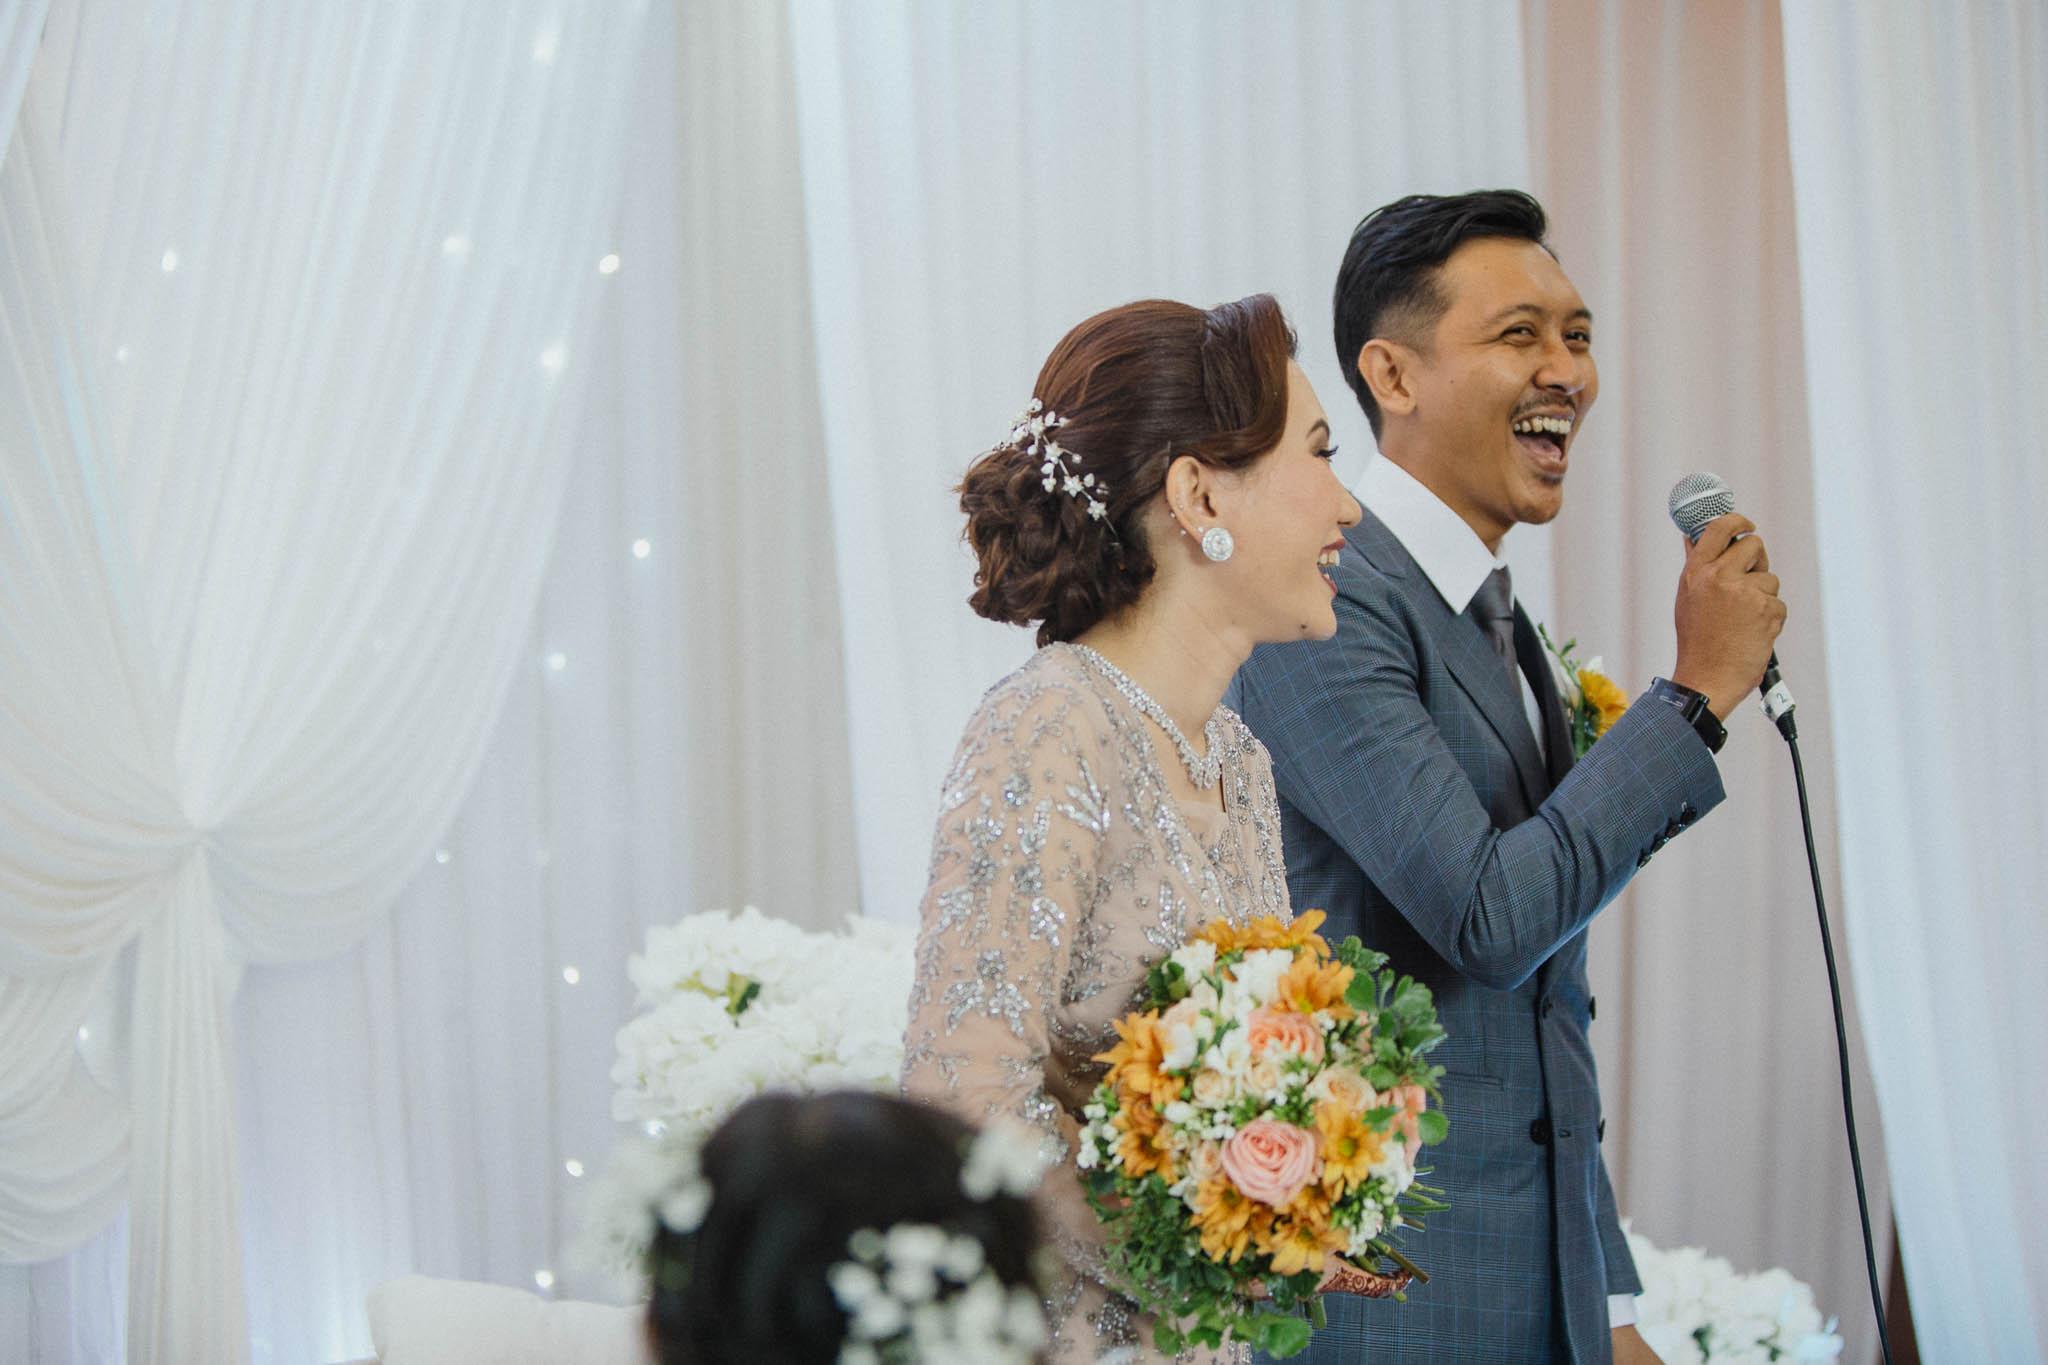 singapore-wedding-photographer-addafiq-nufail-057.jpg